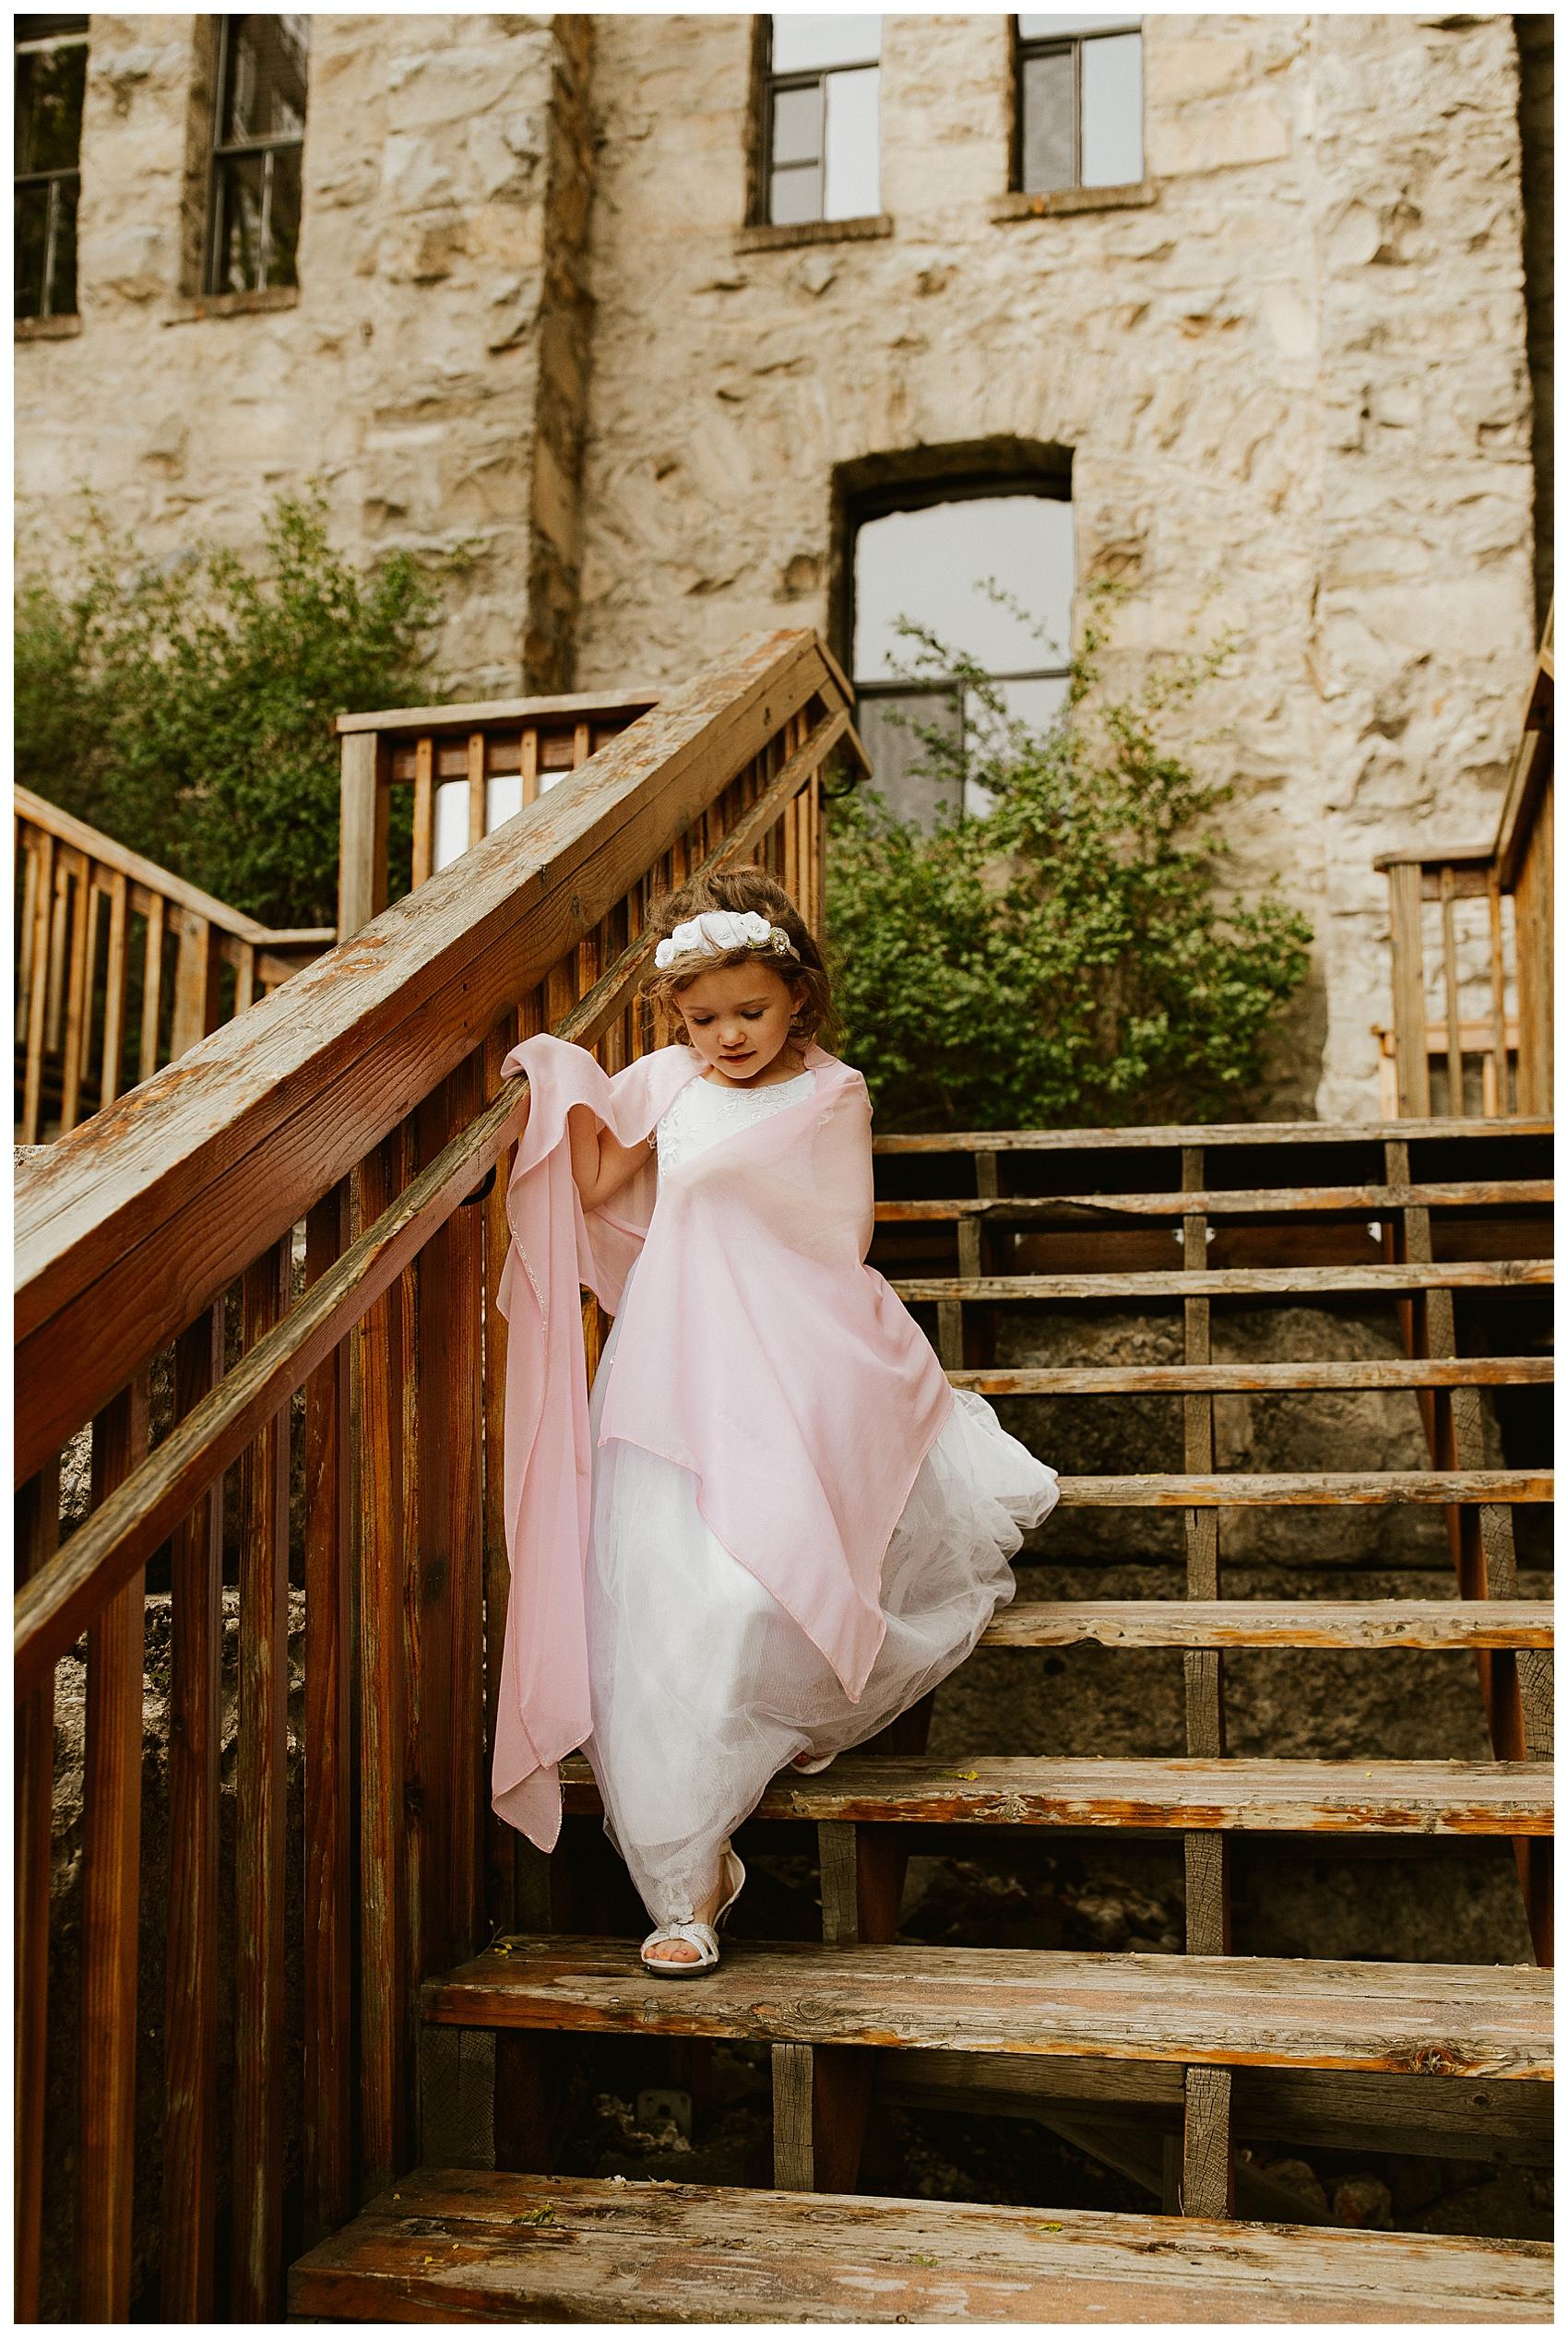 Chateau Rive Spokane Wedding Cassie Trottier Photography01032.jpg